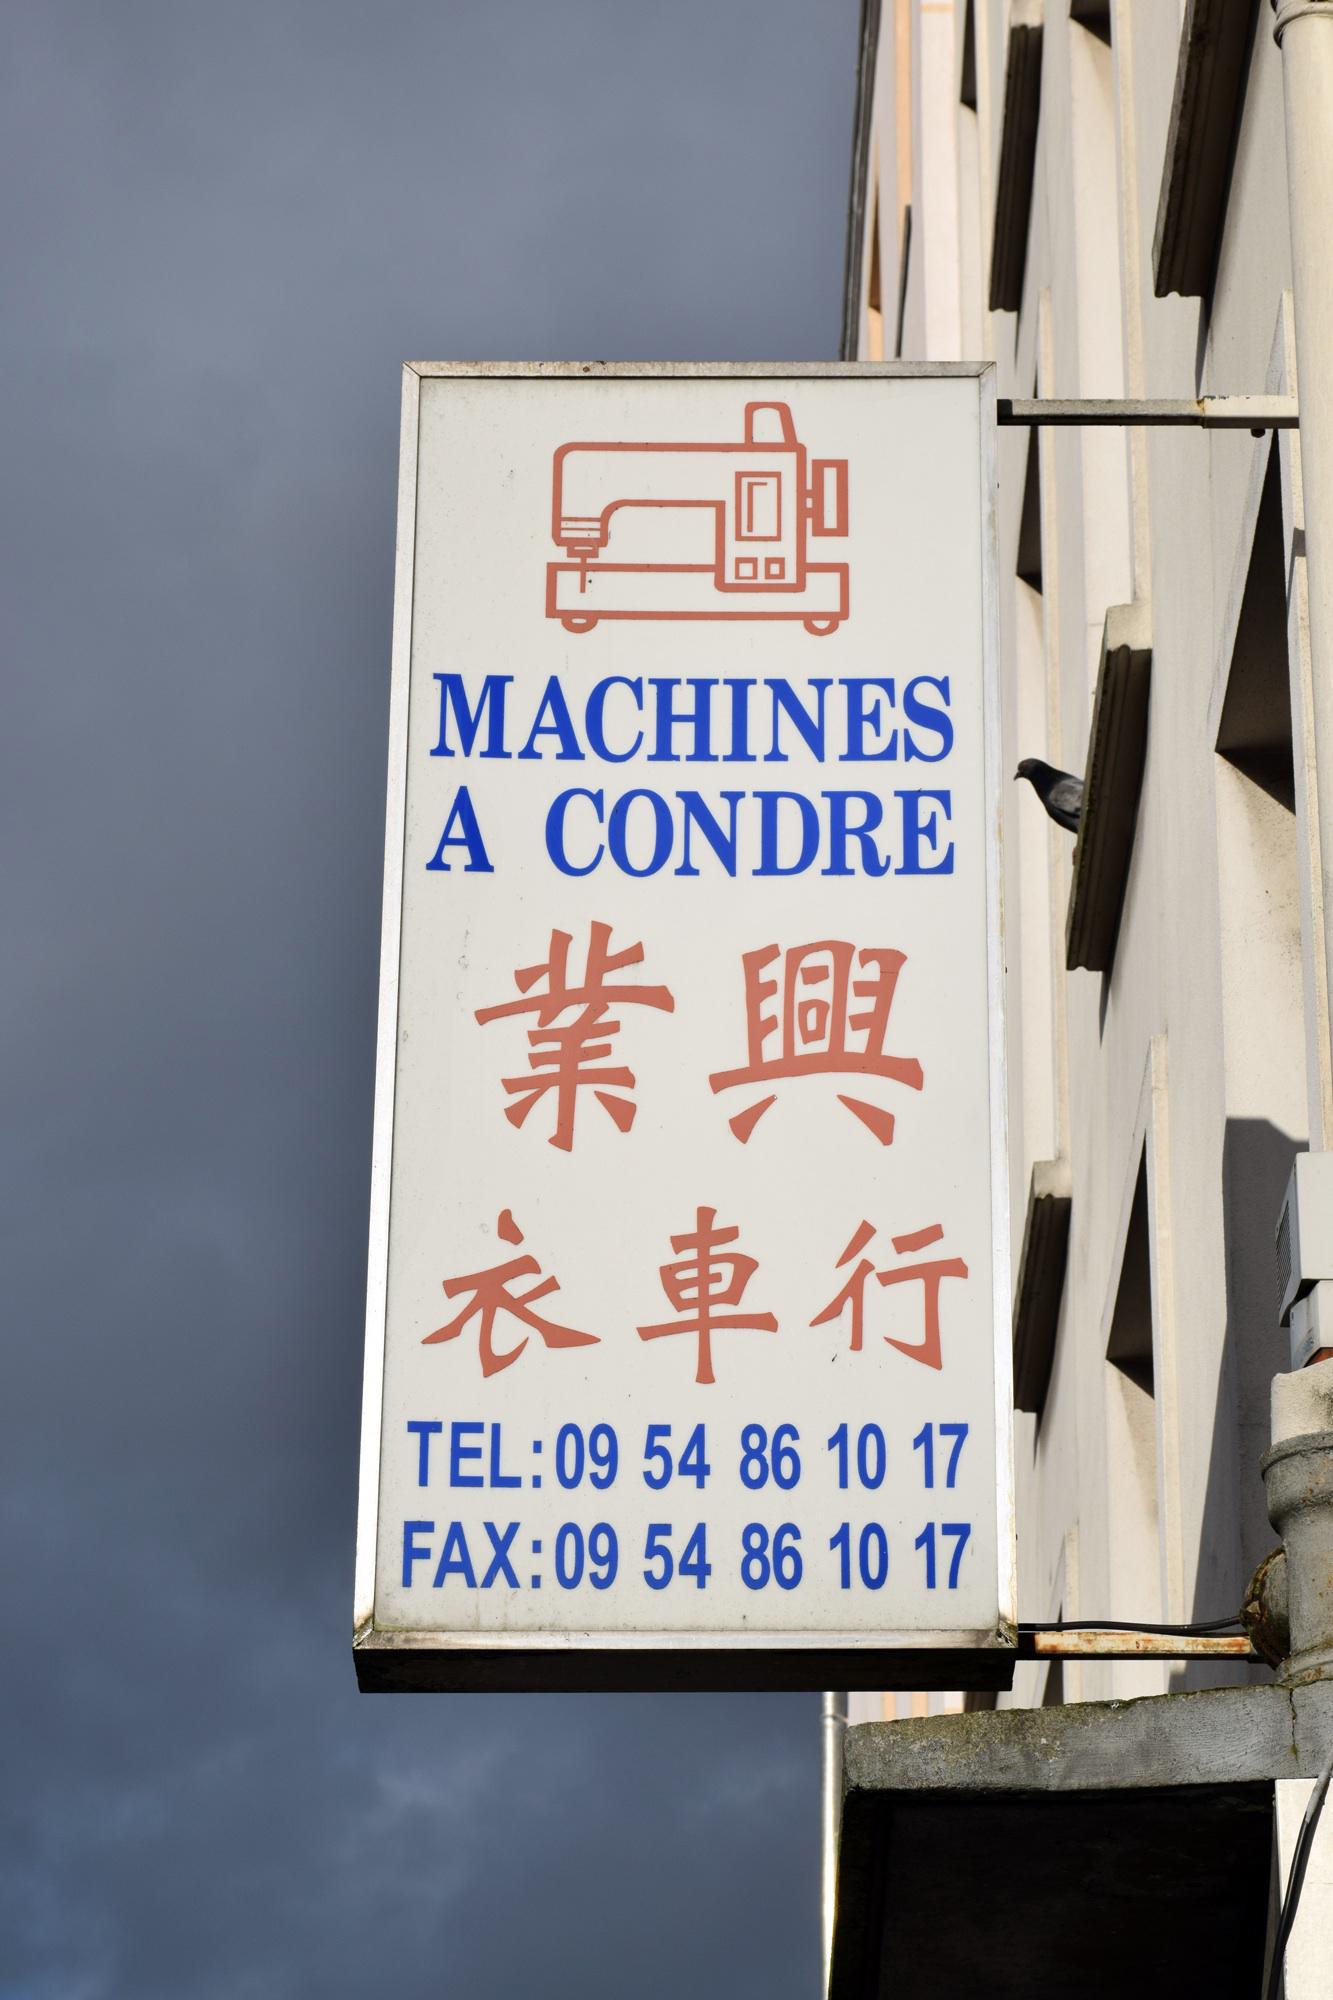 Machines a_ condre, Alexandre Ge_rard 2018 72dpi